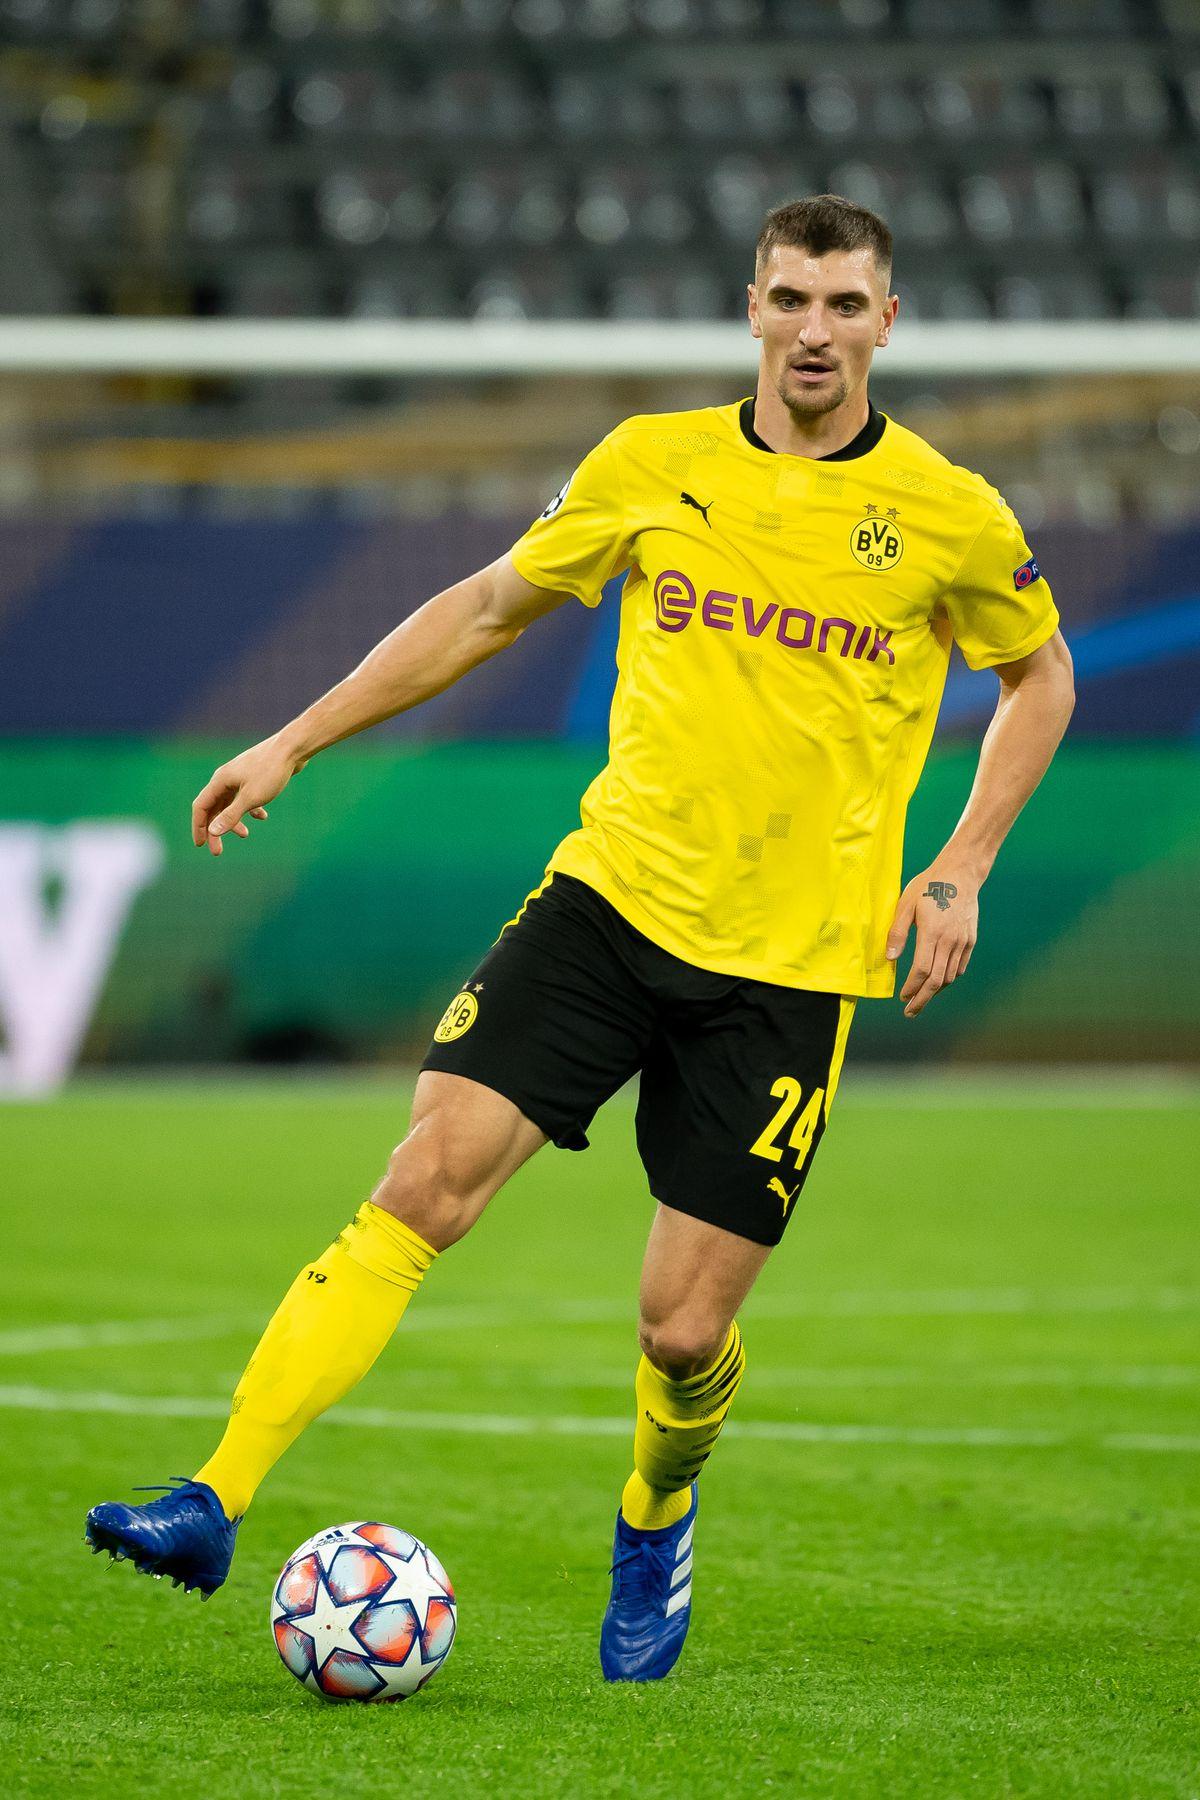 Borussia Dortmund v Zenit St. Petersburg: Group F - UEFA Champions League